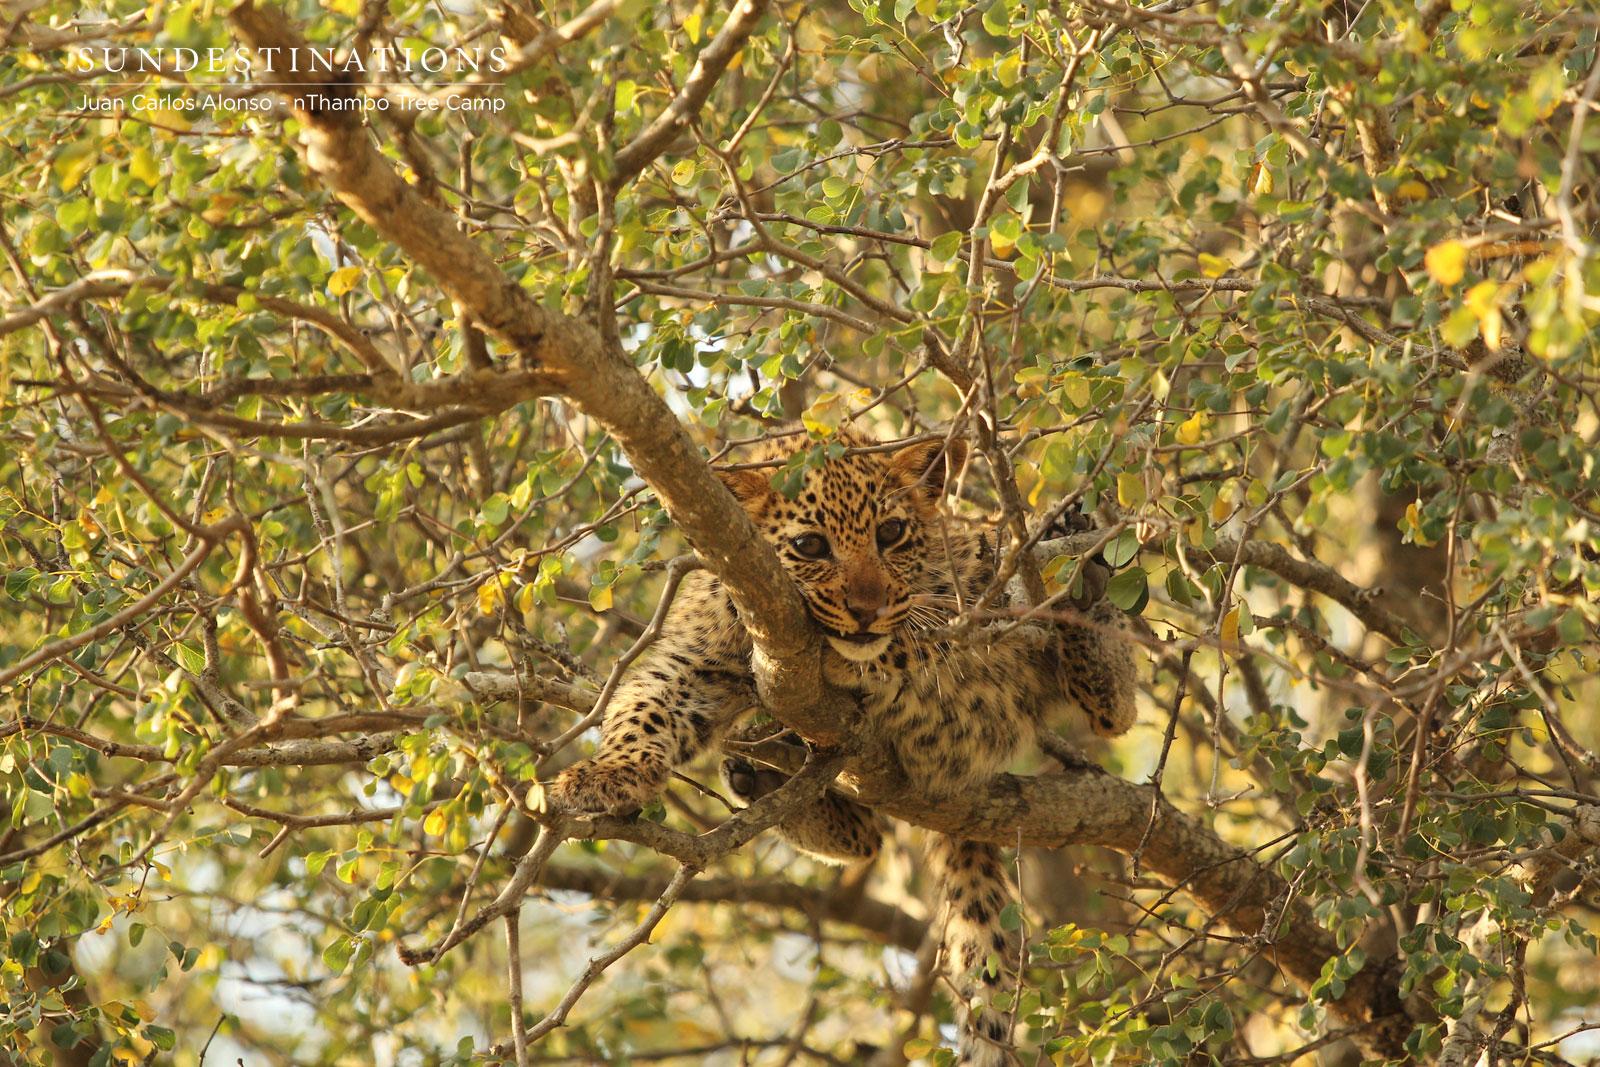 Leopard Cubs in Klaserie